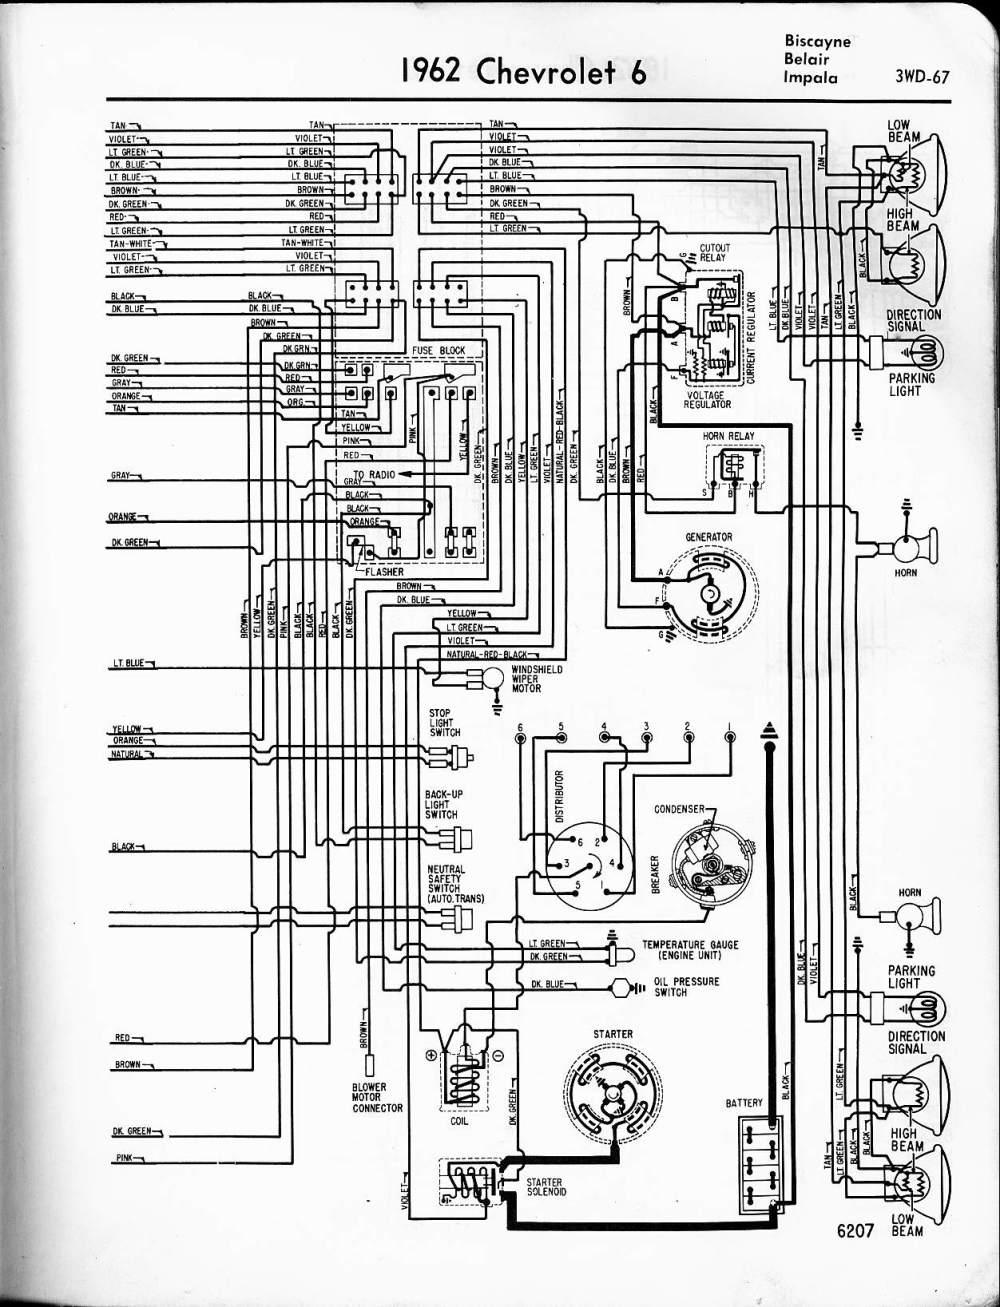 medium resolution of 1964 fuse box diagram wiring wiring diagrams instructions 2000 ford f 150 fuse panel diagram 1964 impala